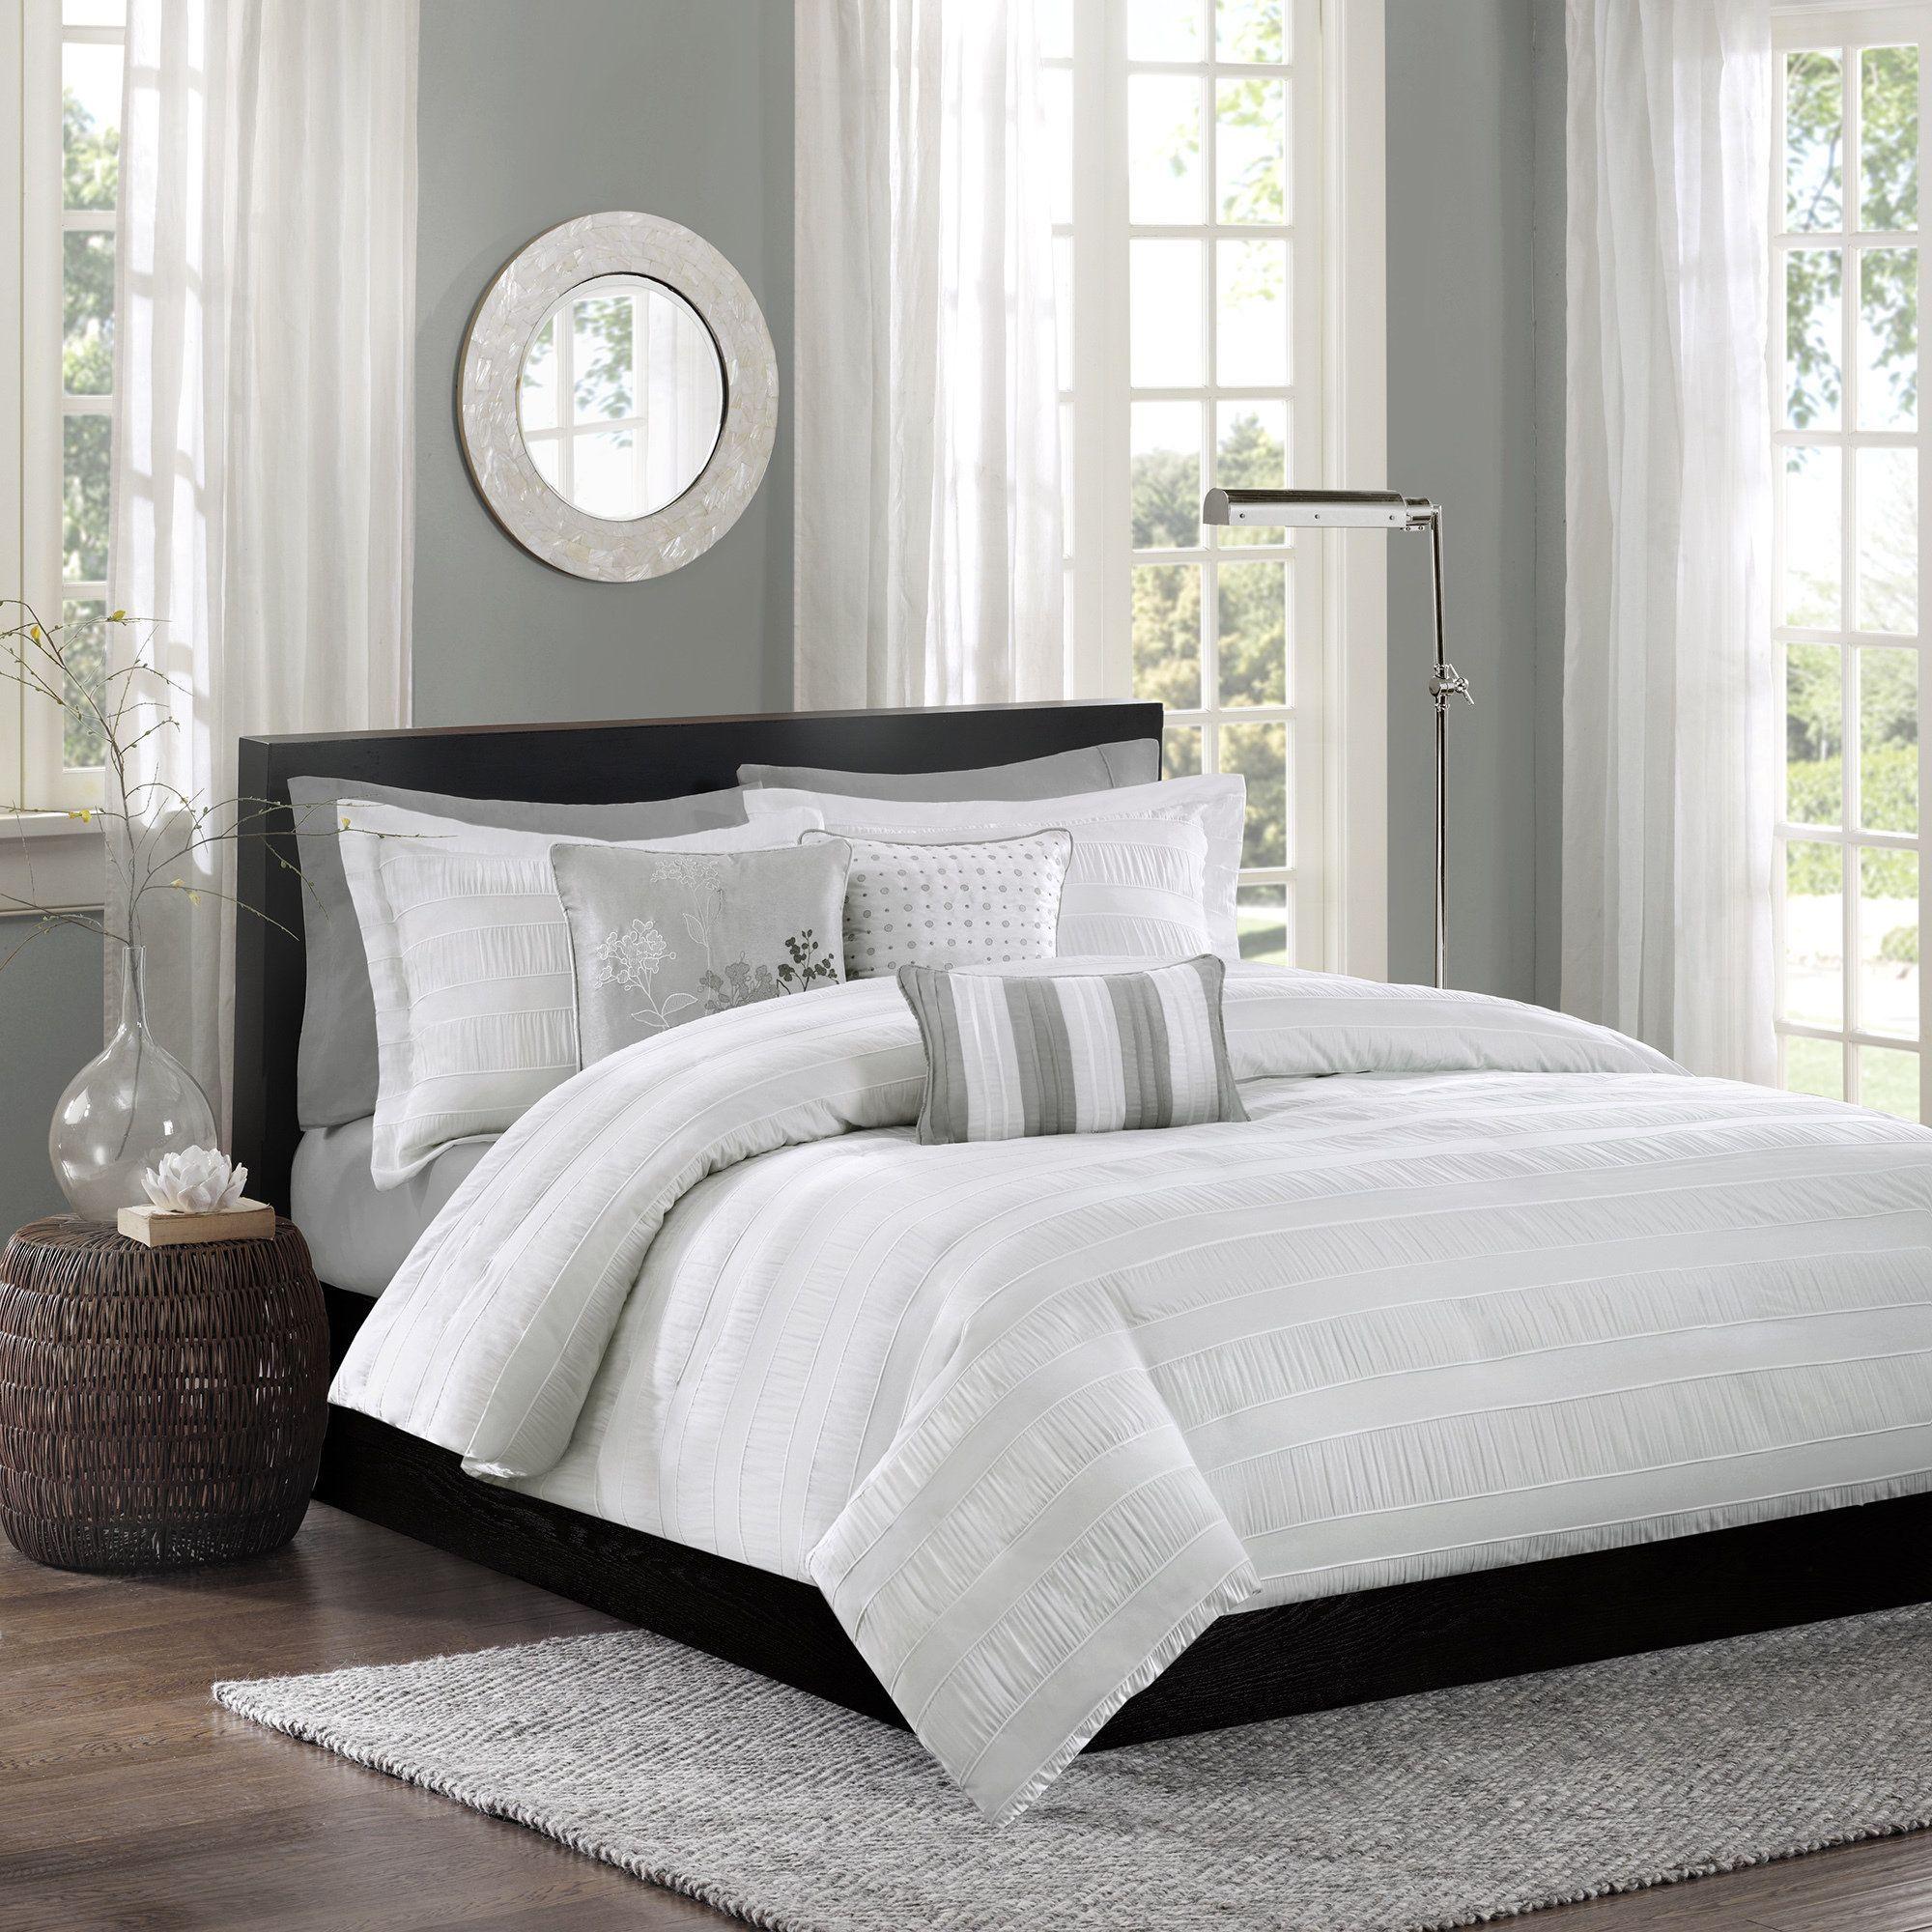 duvet set white cotton piece paisley cover tara park madison covers grey